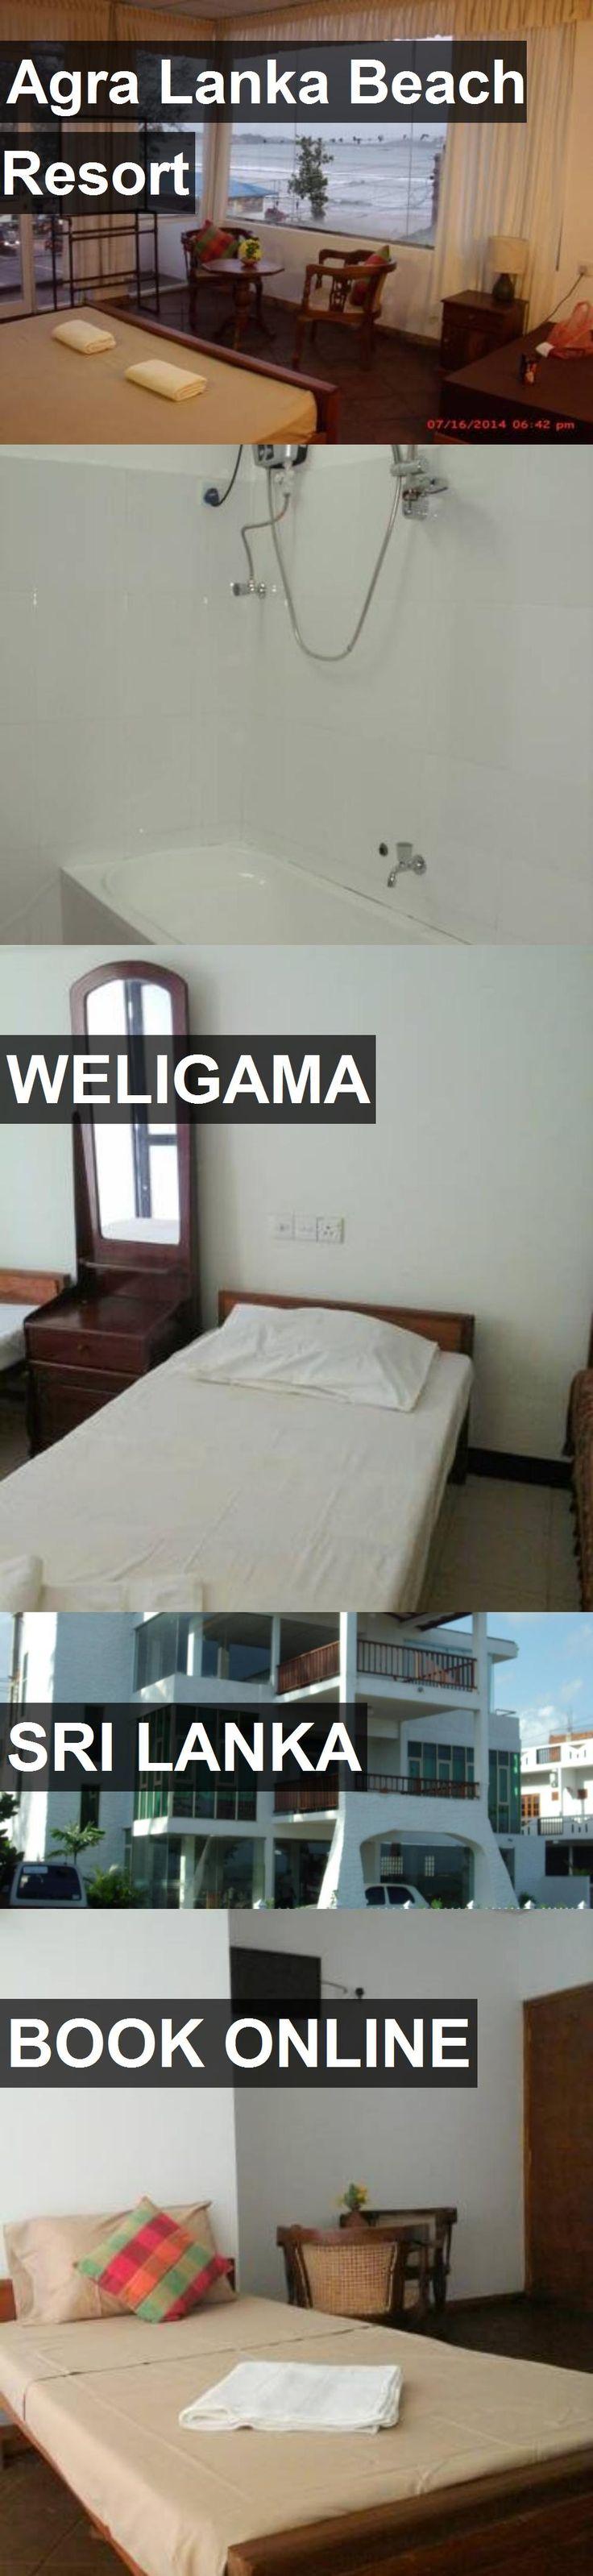 Hotel Agra Lanka Beach Resort in Weligama, Sri Lanka. For